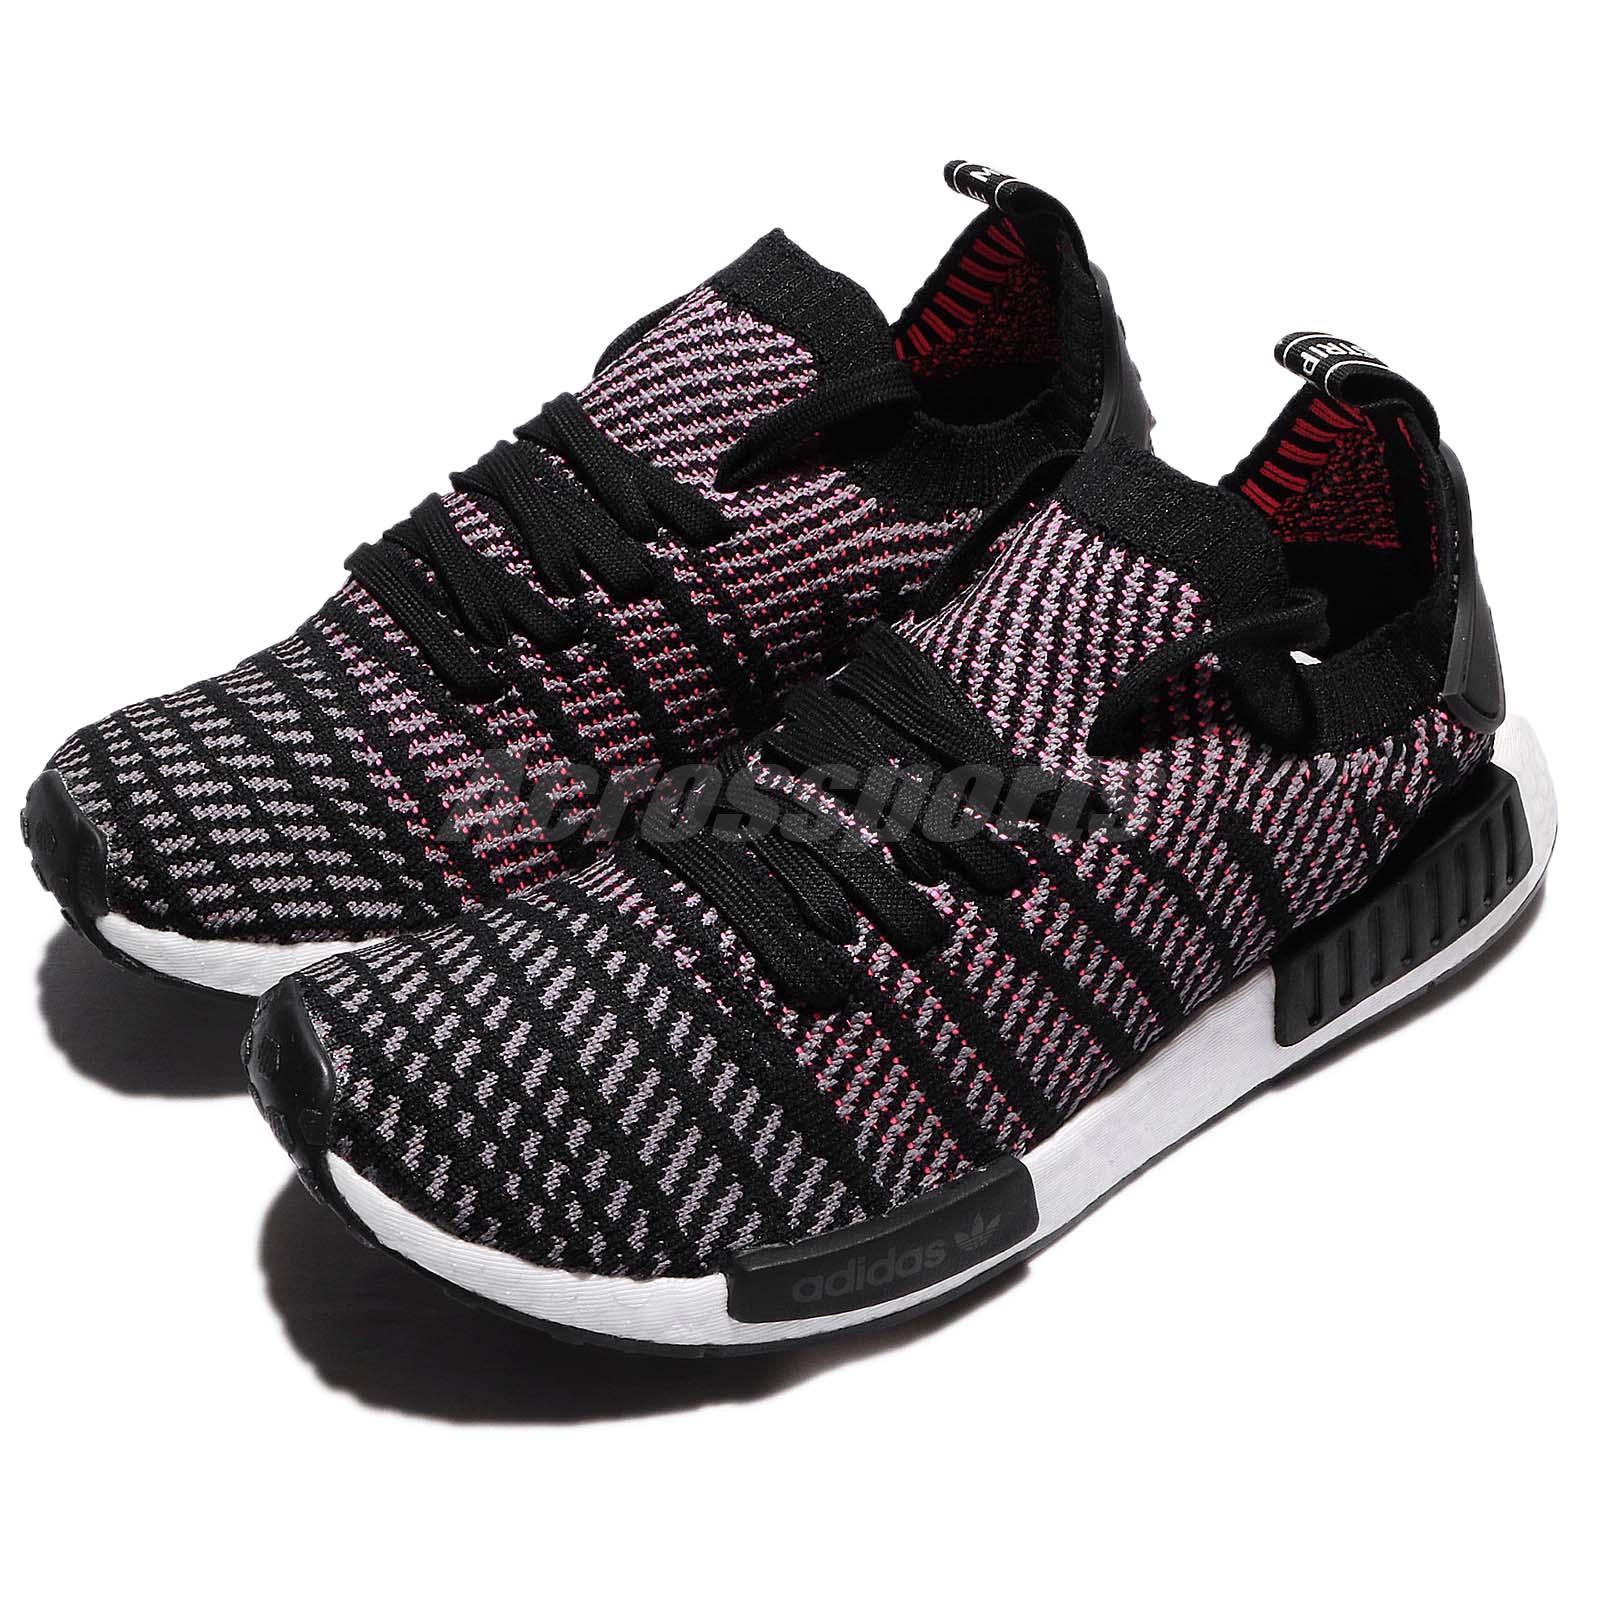 Details about LOW PRICE! Adidas NMD R1 STLT PK BlackGreySolar Pink Size 12 CQ2386 NEW